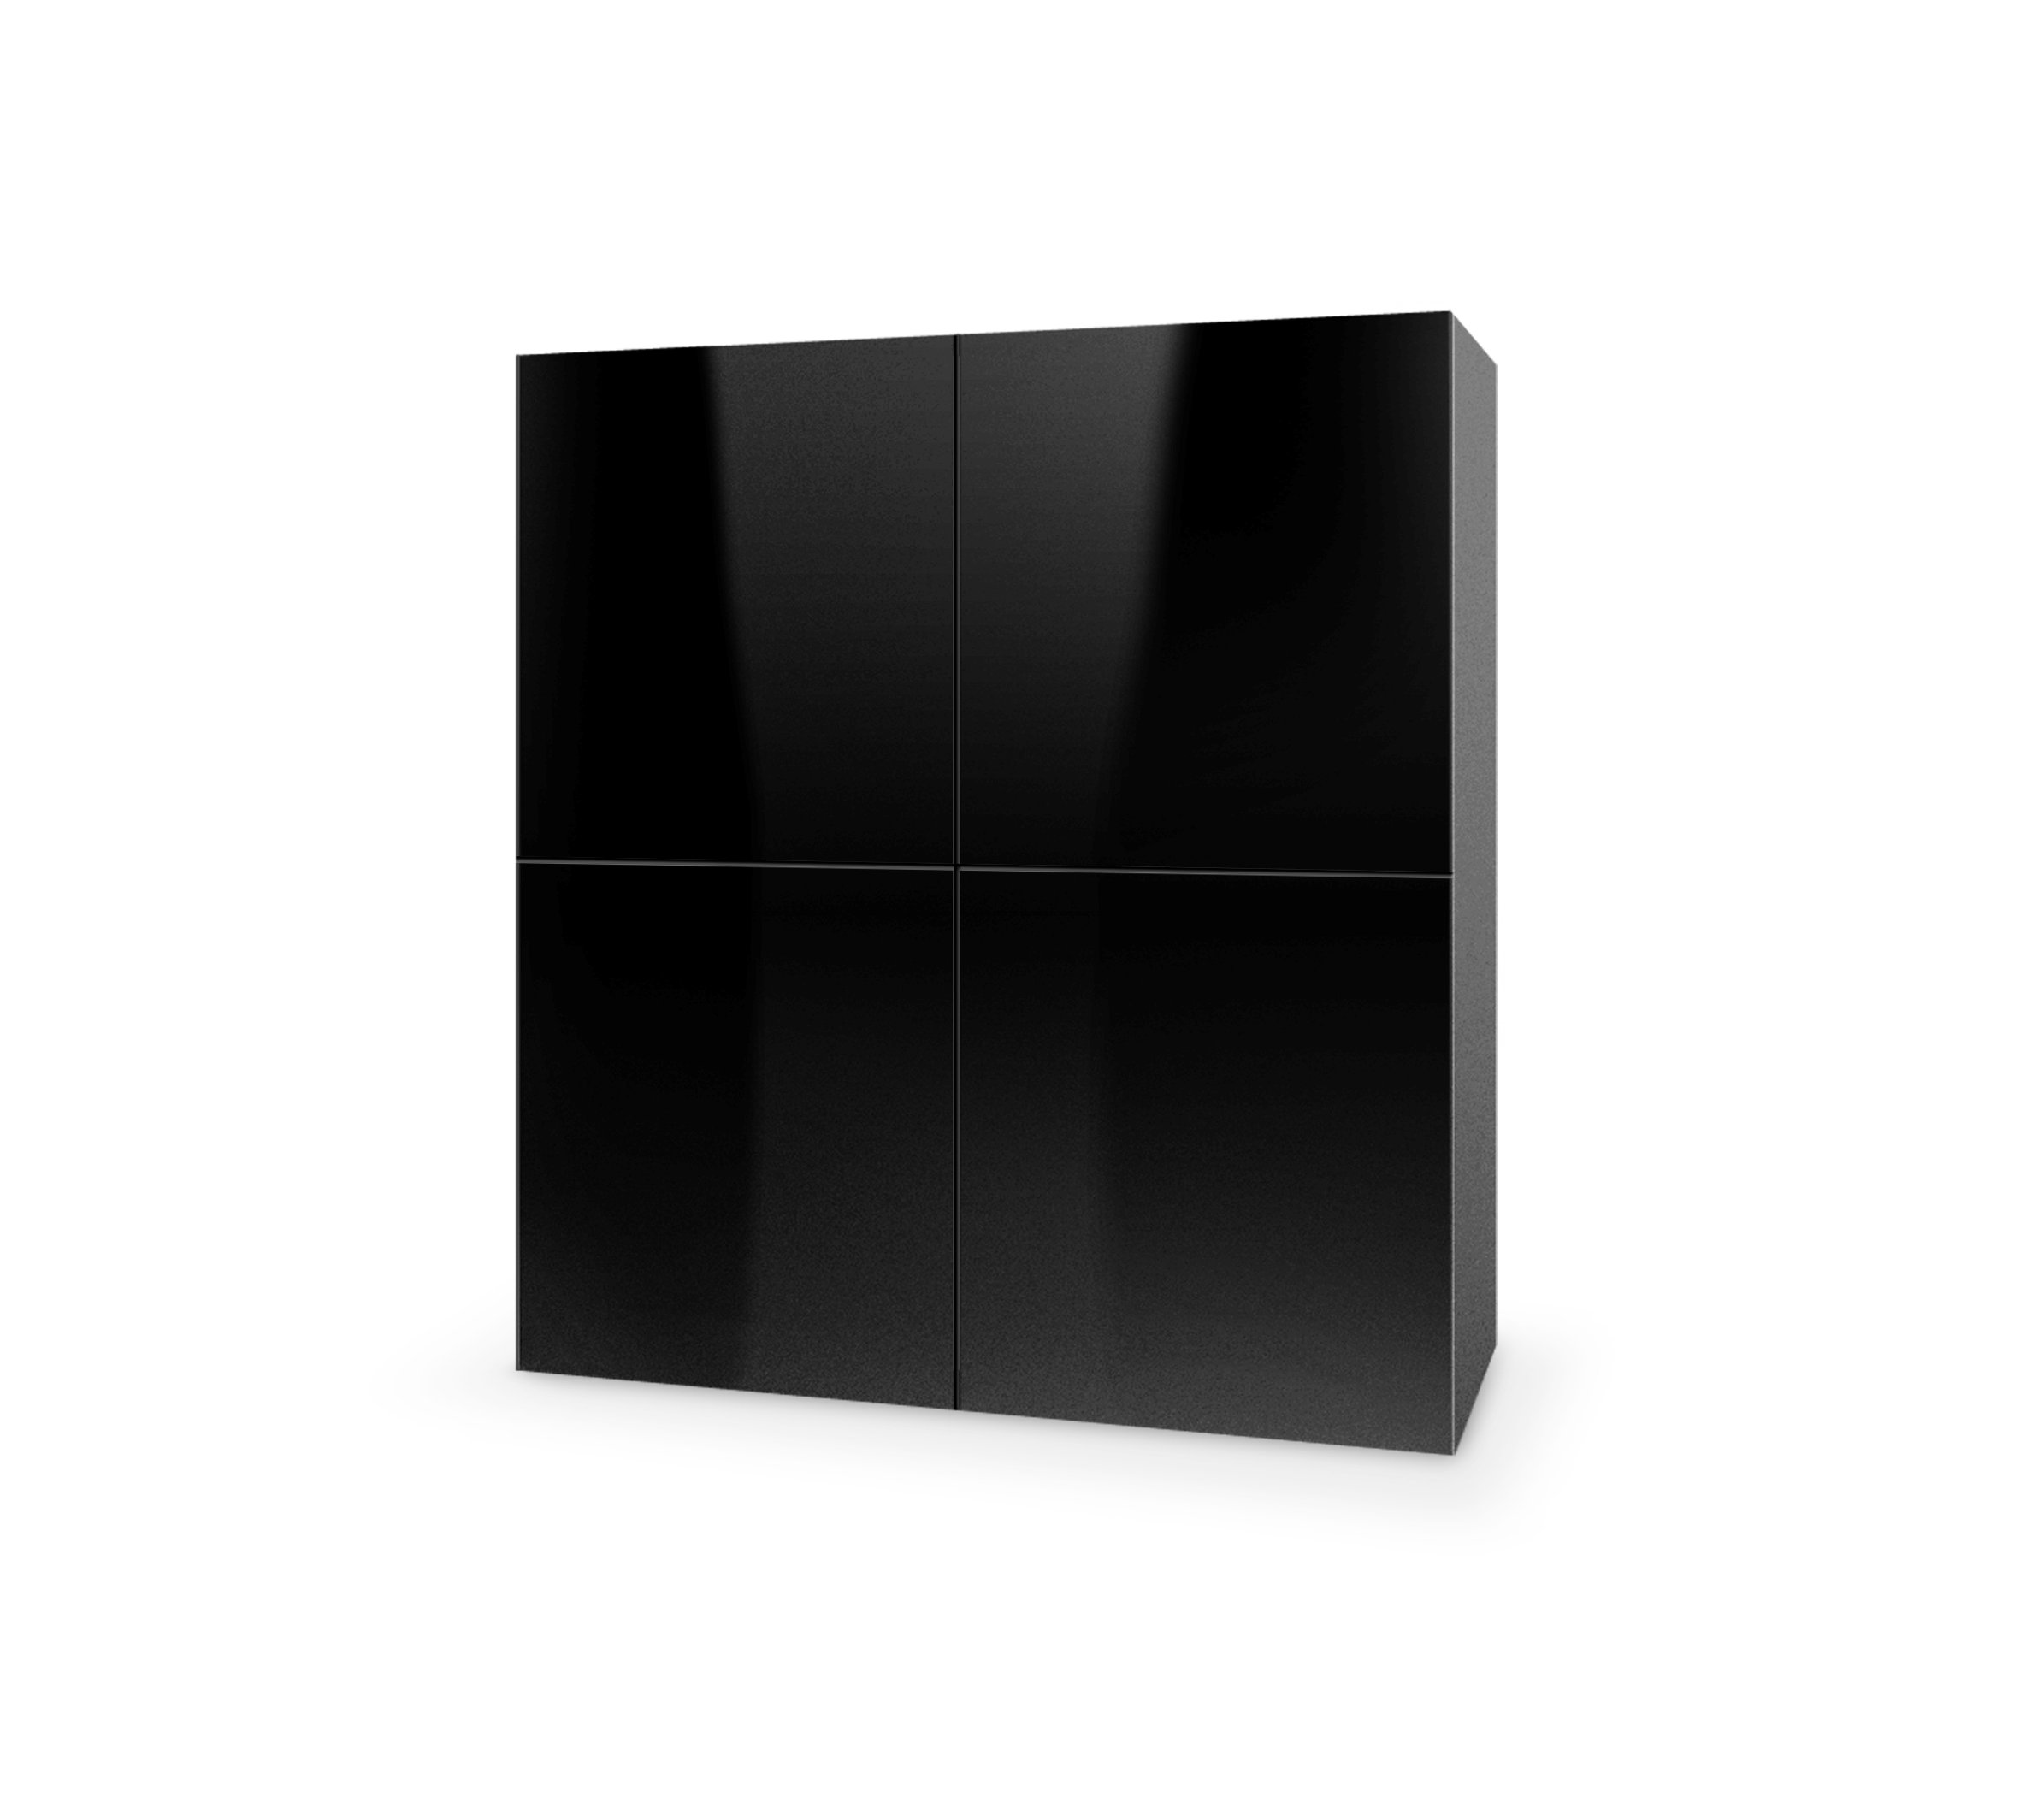 Dulap din MDF Livo KM-100 Black